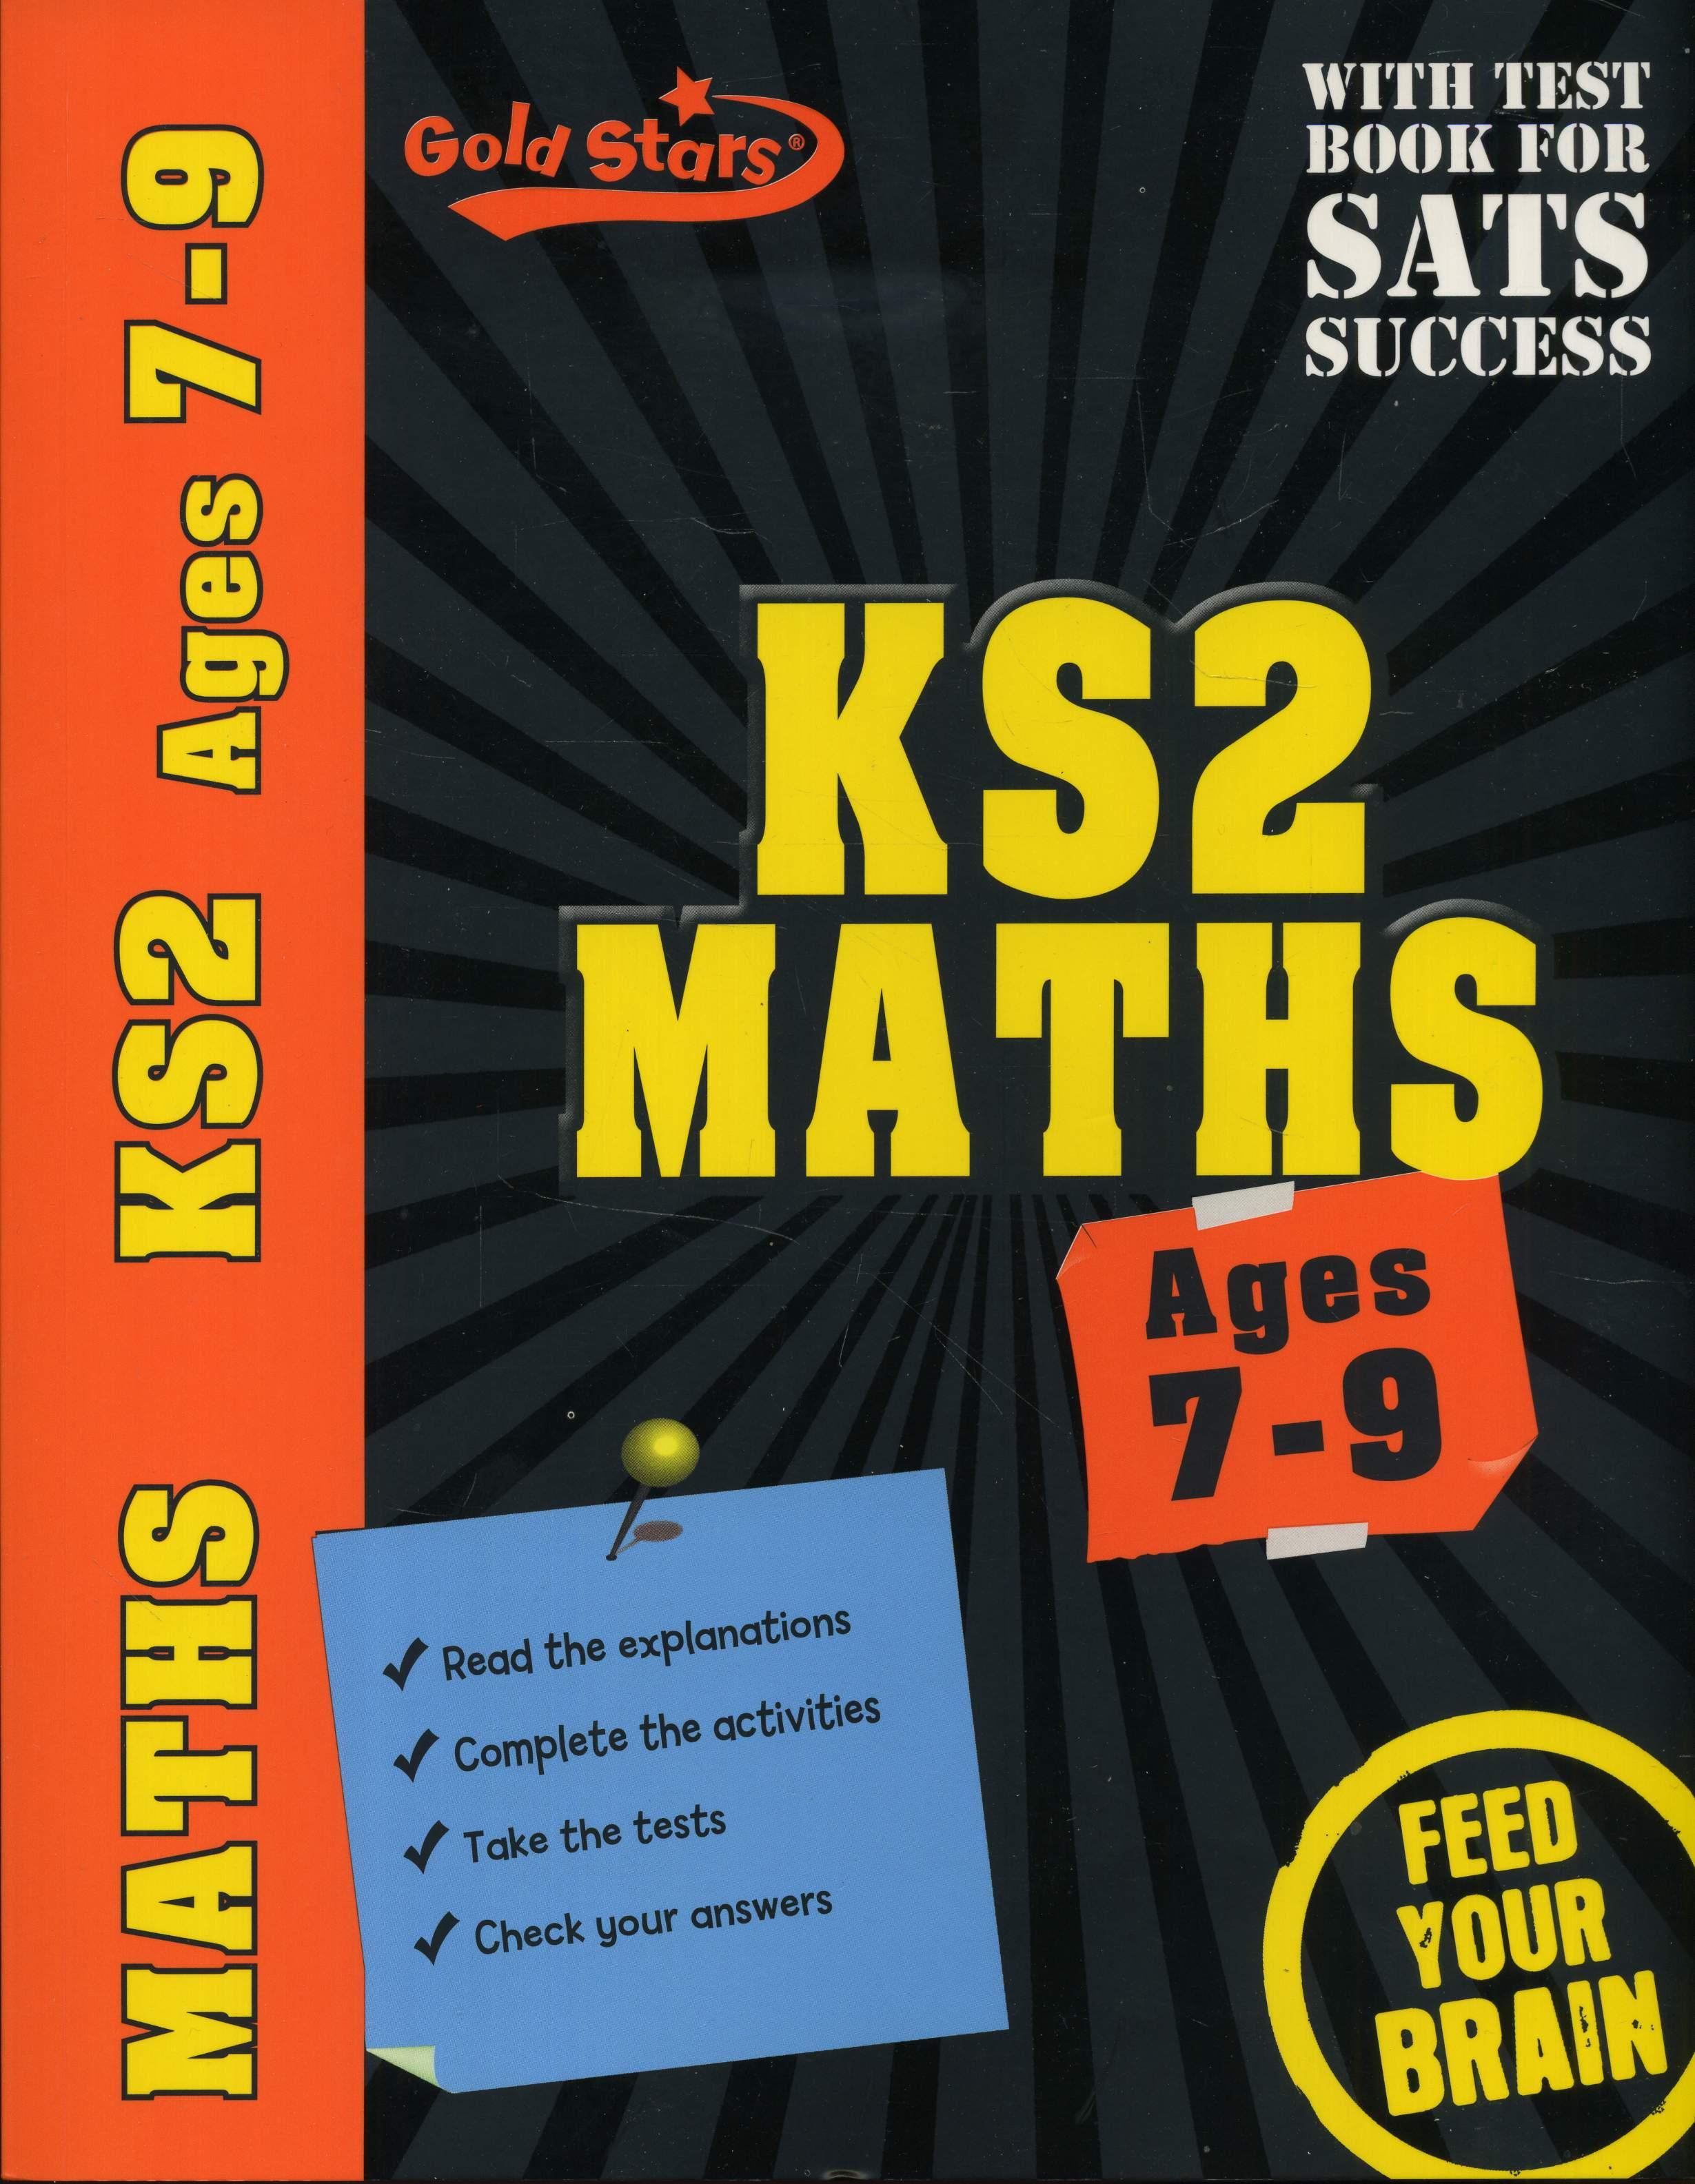 Maths Key Stage 2 Gold Stars Workbooks Ks2 Age 7 9 New